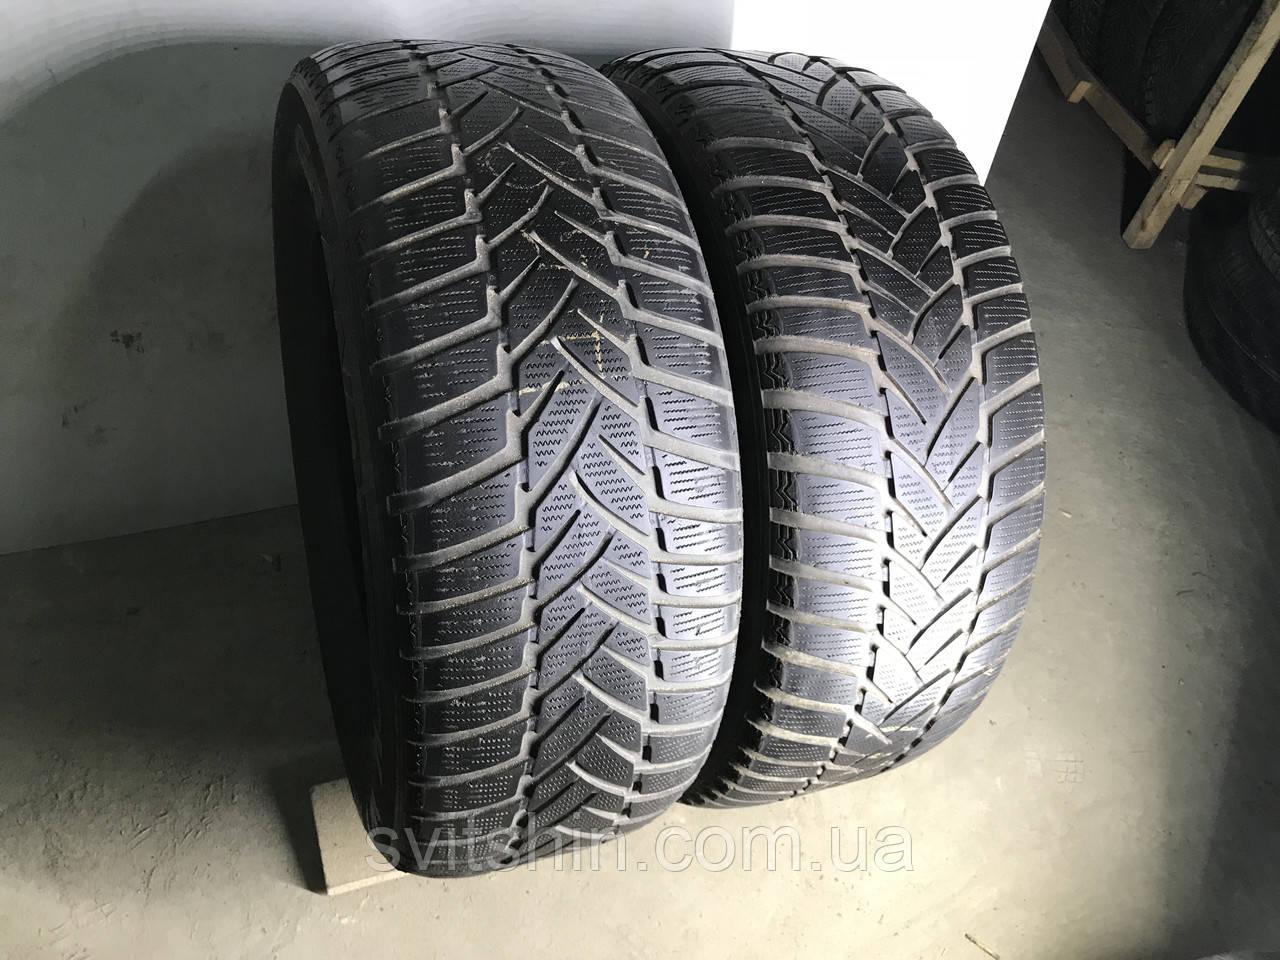 Шины бу зима 265/55R19 Dunlop Grandtrek WT M3 2шт (4,5-5мм)